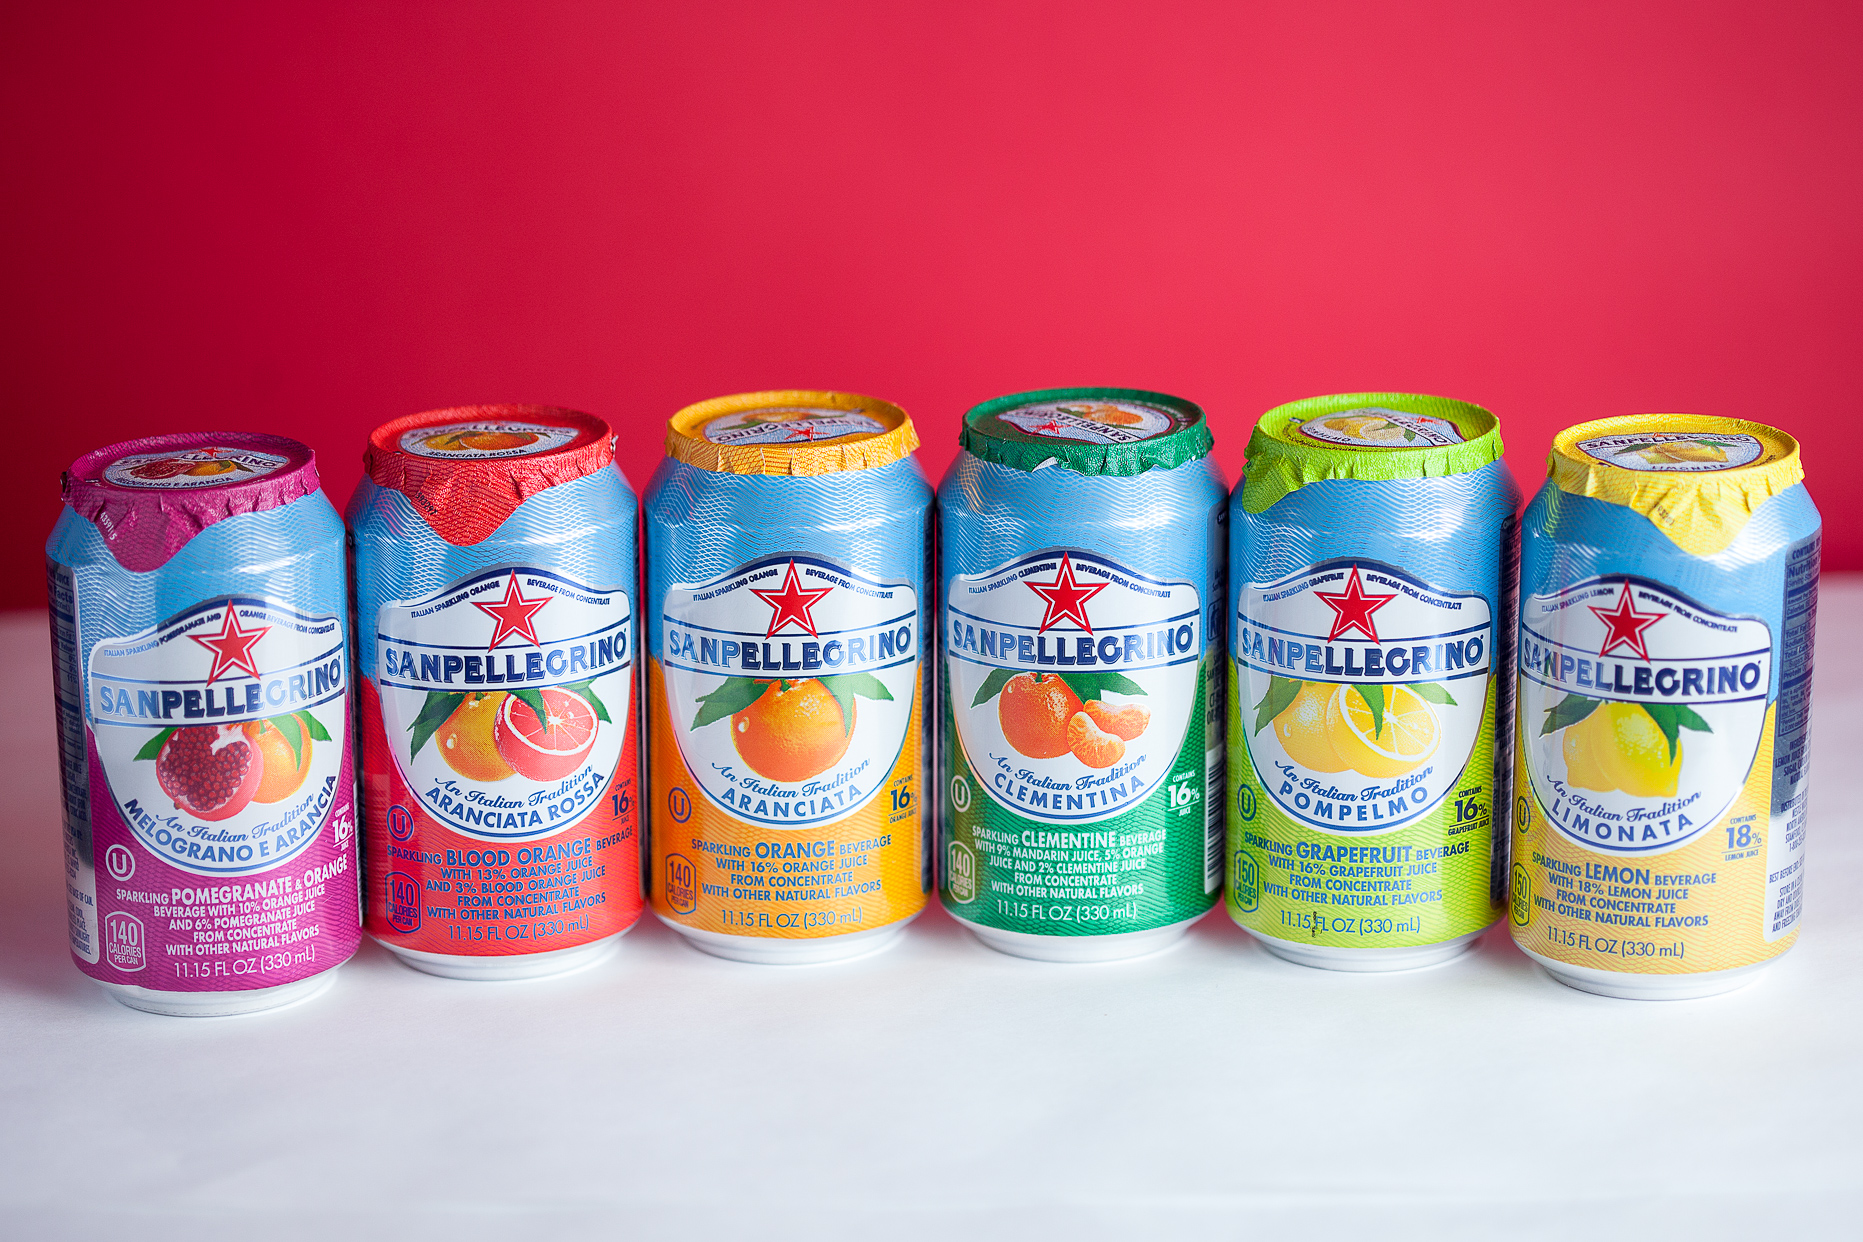 San Pellegrino Imported Real Fruit Sodas